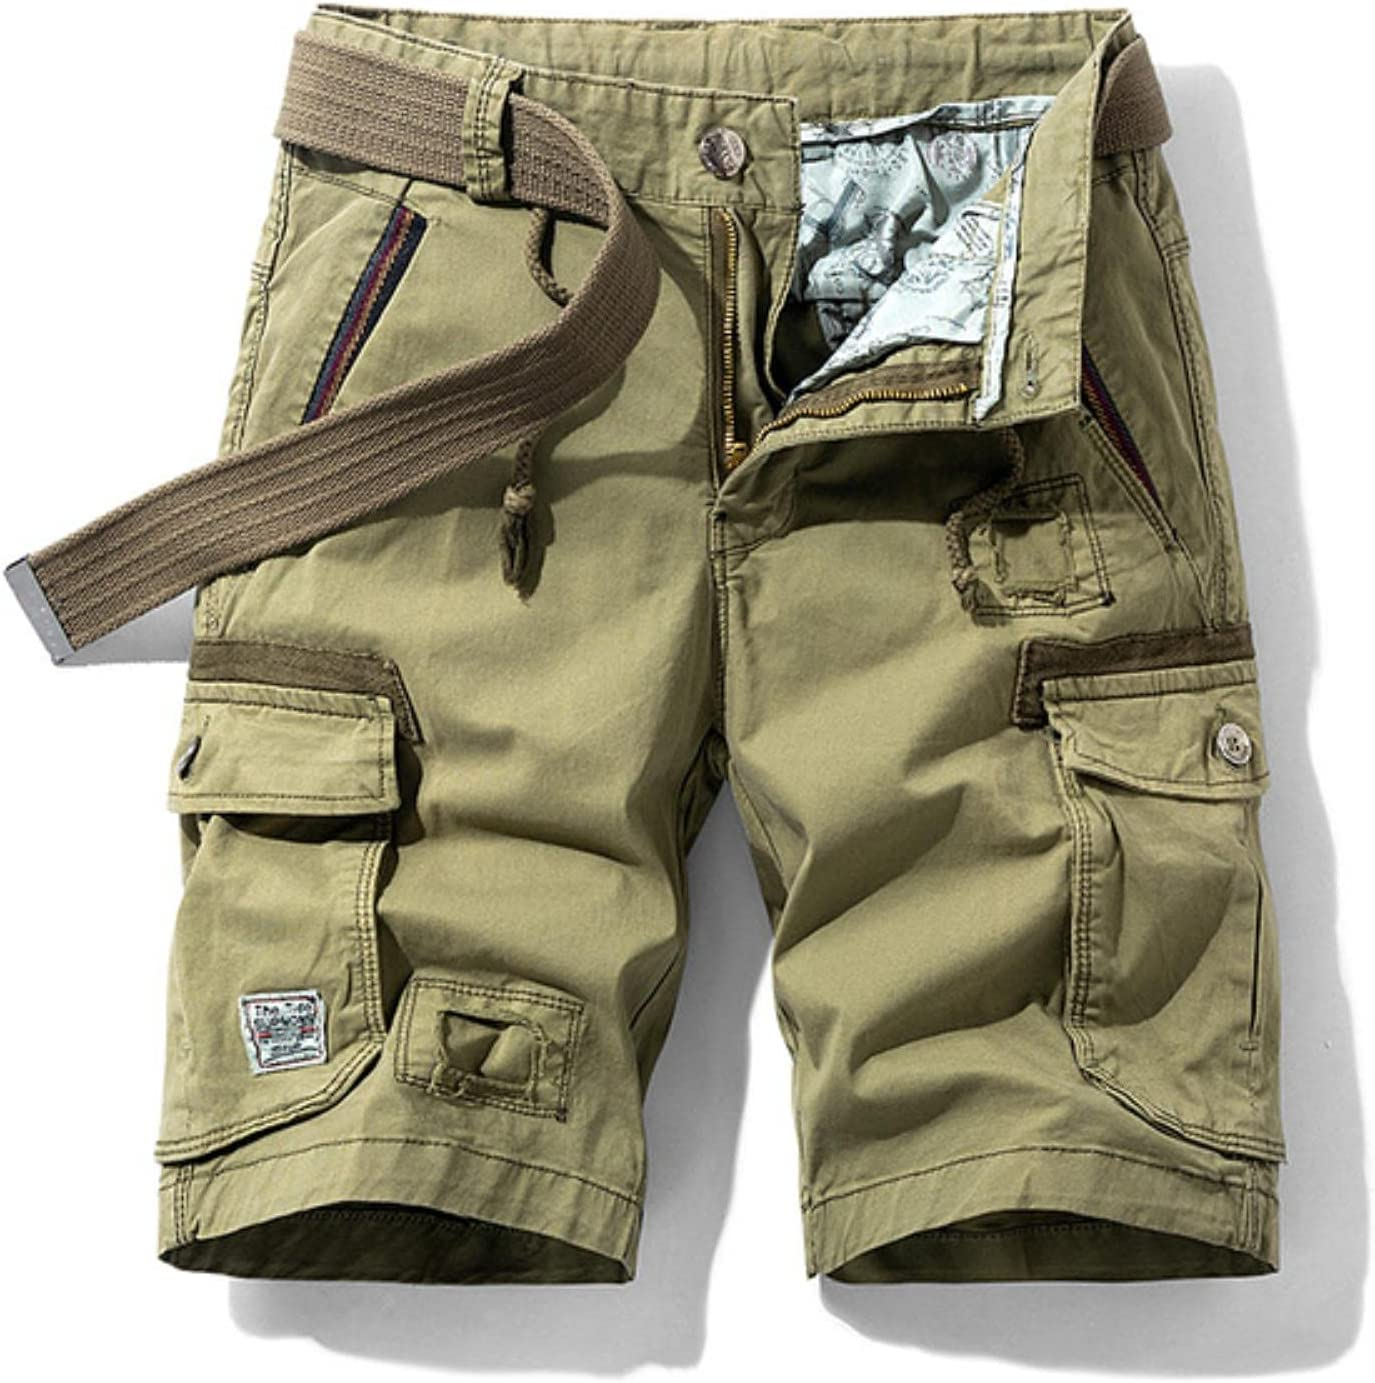 2021 Summer Cotton Cargo Shorts Men Casual Multi-Pocket Military Shorts Pants Loose Work Army Tactical Shorts Men